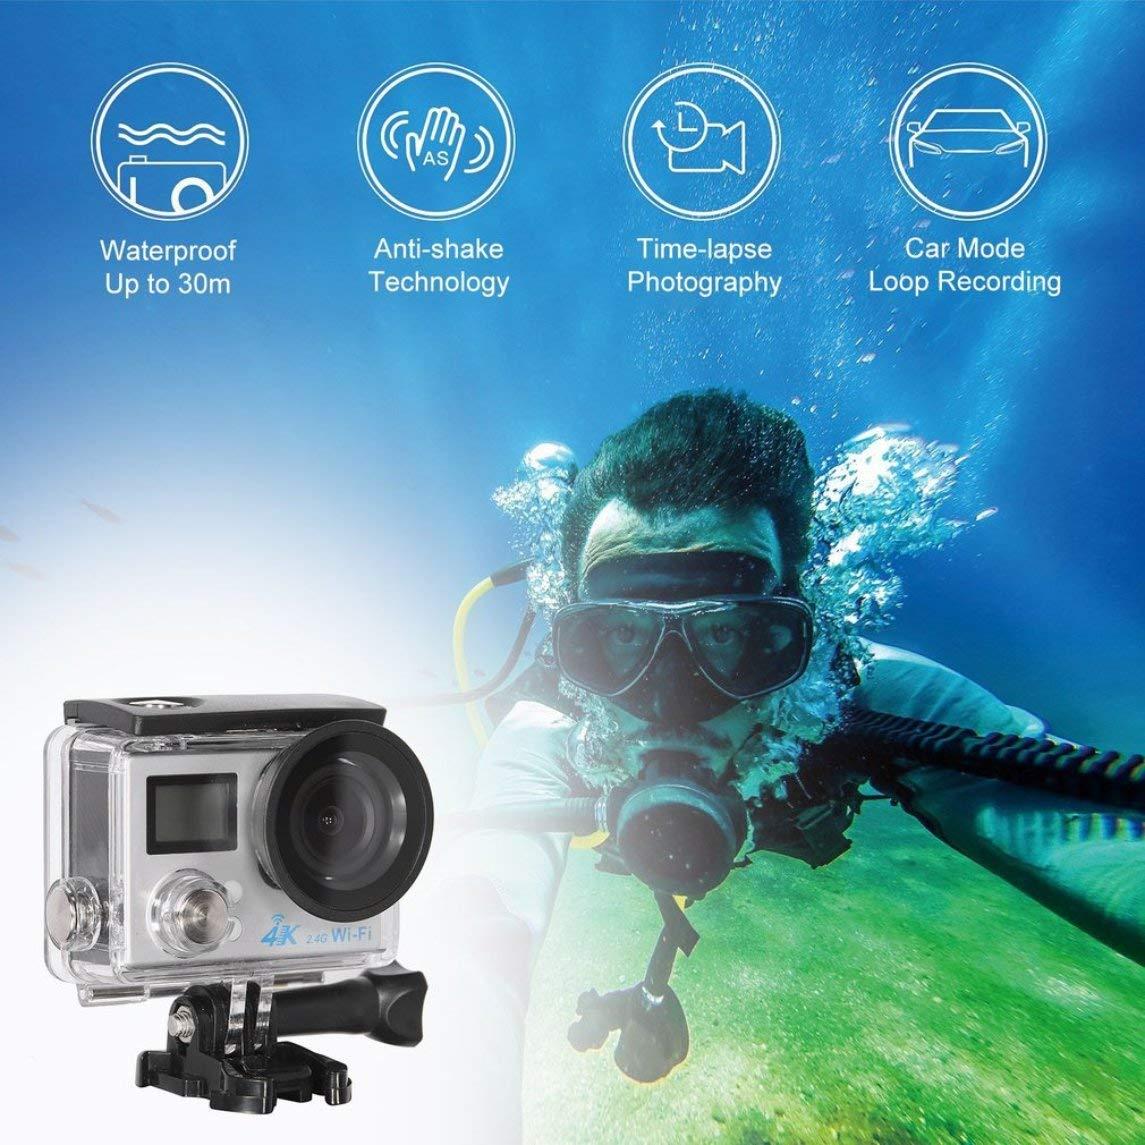 Footprintse G91 4K Ultra HD 1080P Mini wasserdicht WiFi Remote Action Cam Dual LCD Display-Farbe  schwarz